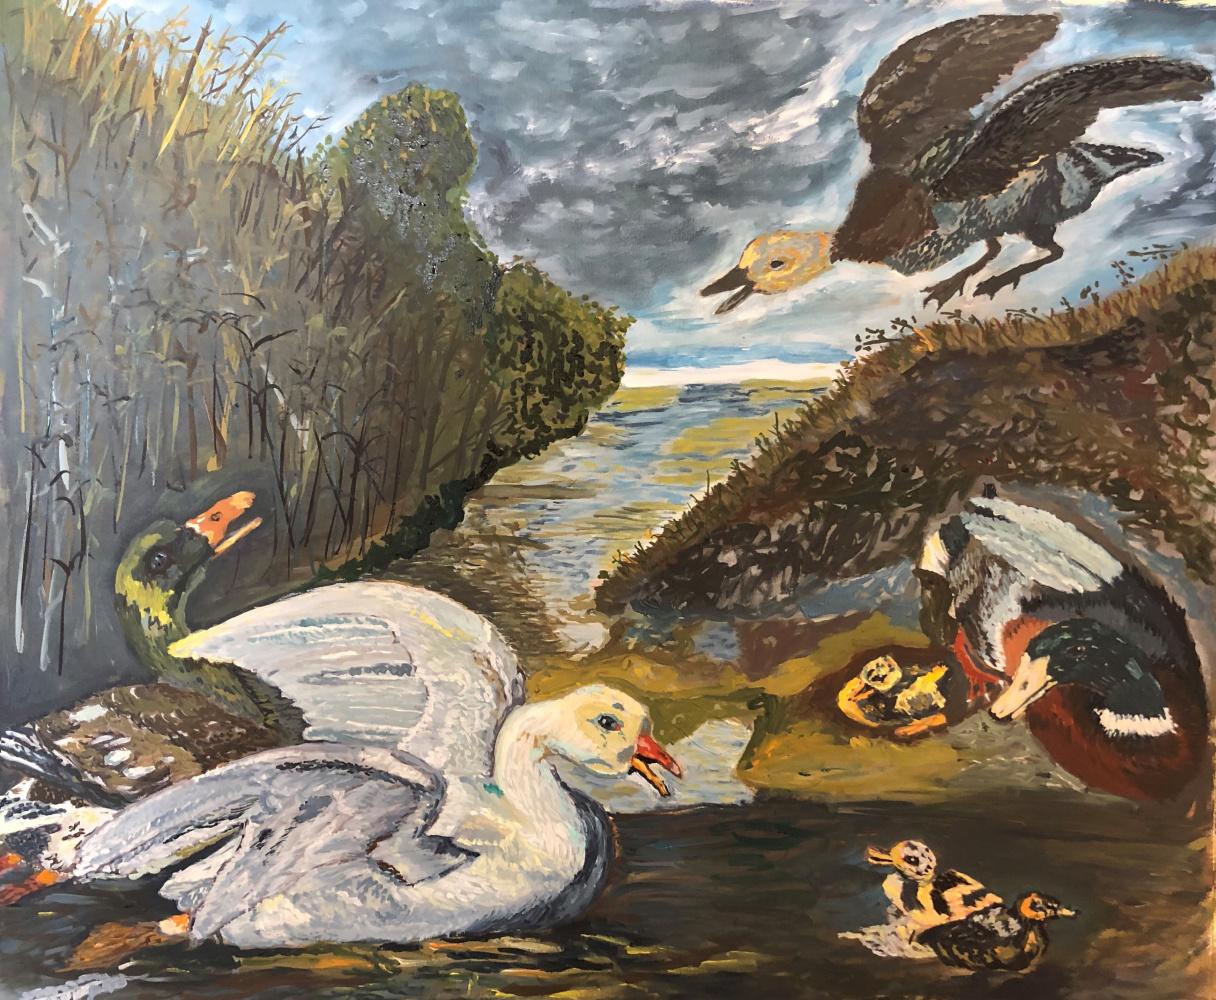 Sergey Vladimirovich Sebini. Geese and ducks. Replica based on Jan Spreyt 1660